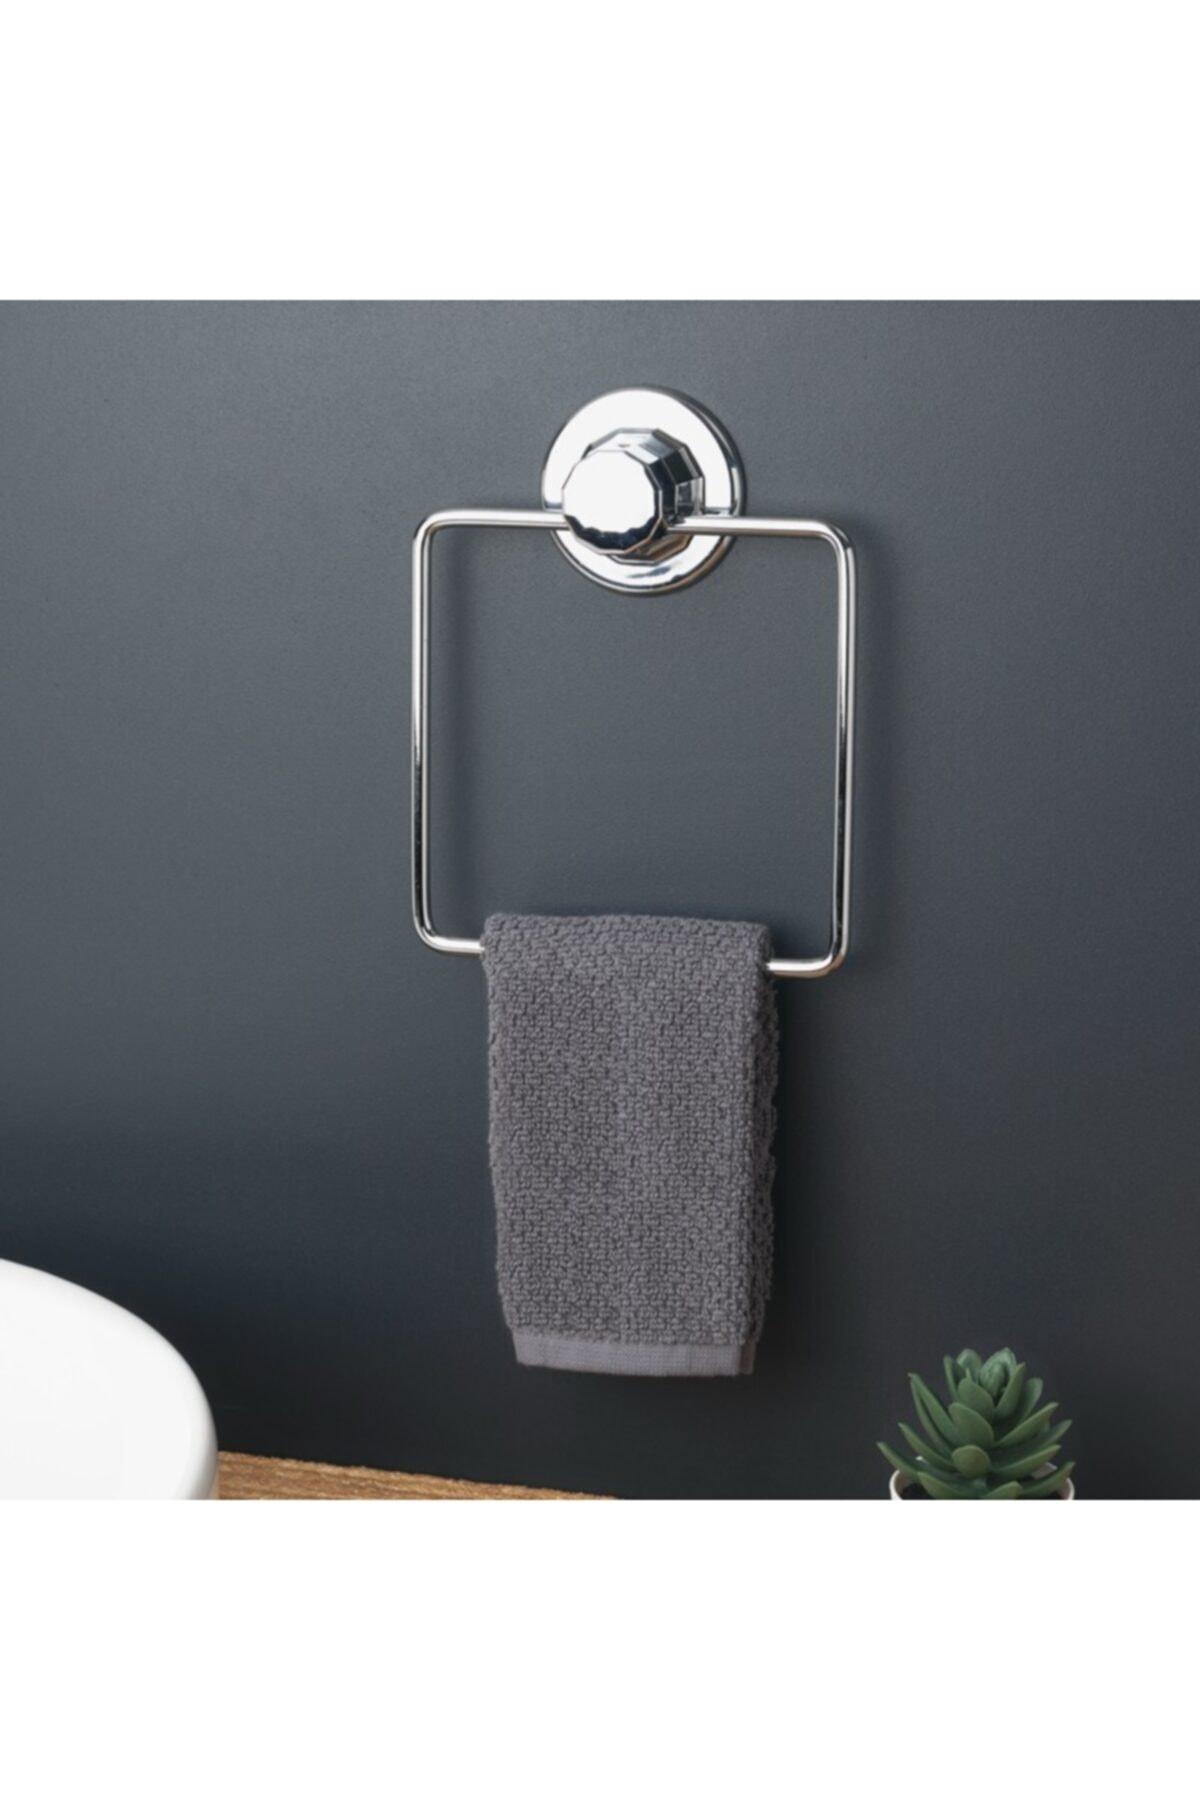 Vakumlu Banyo Tuvalet Havlu Askısı Kare